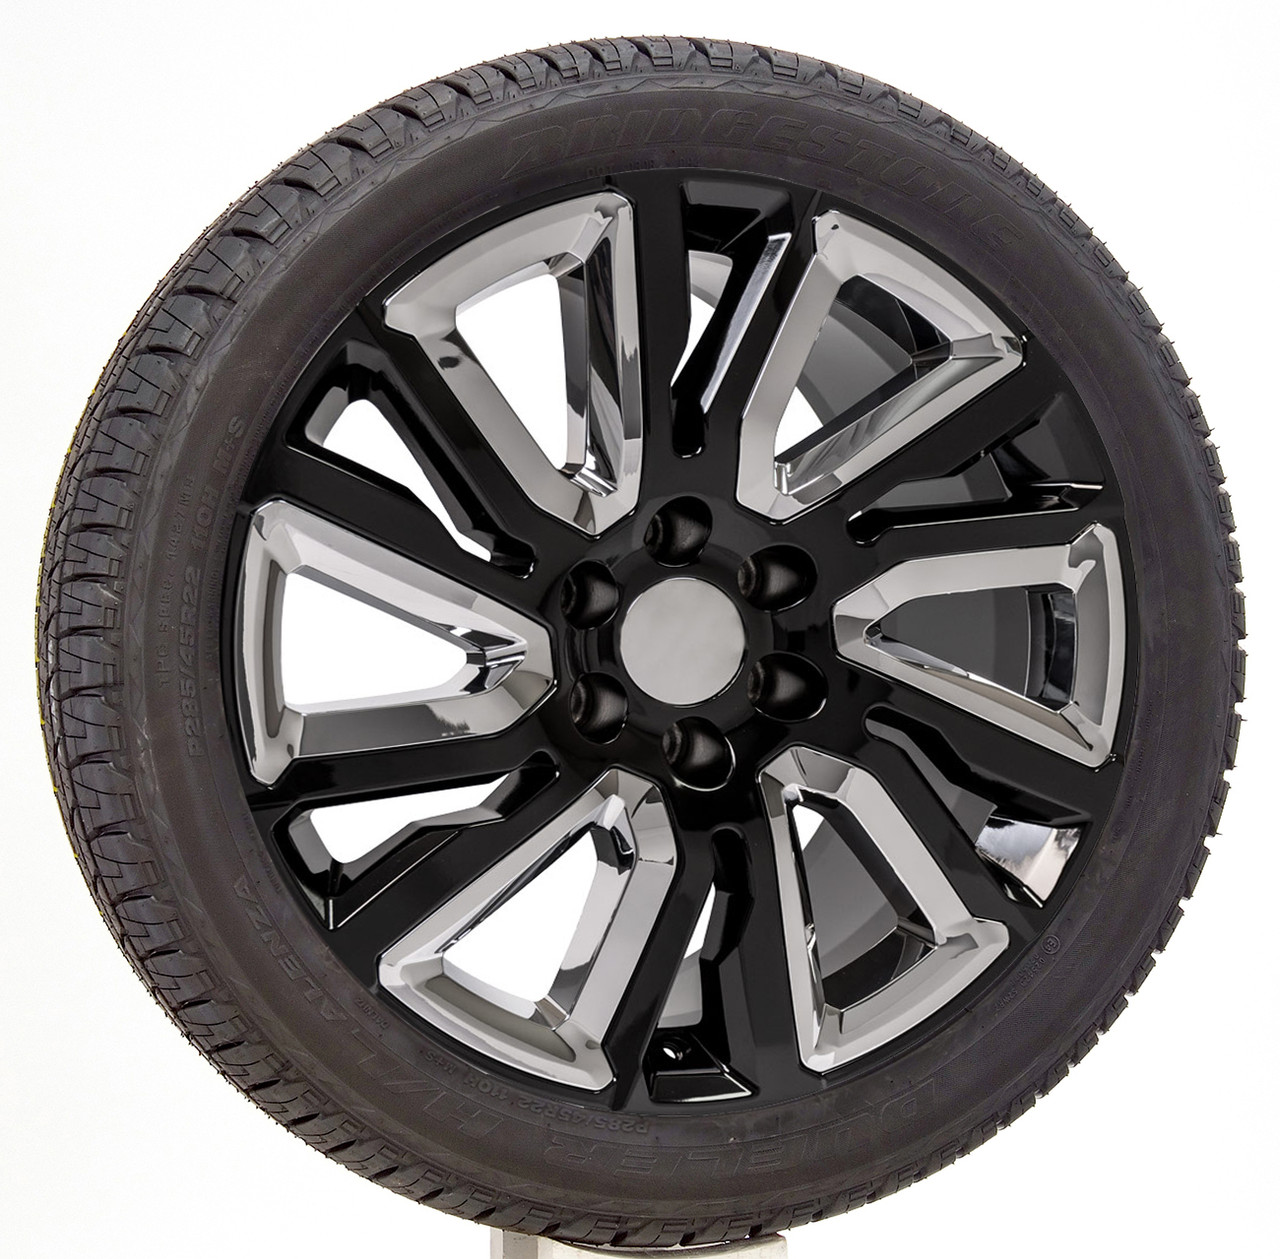 "Gloss Black 22"" with Angled Chrome Wheels with Bridgestone Tires for Chevy Silverado, Tahoe, Suburban - New Set of 4"